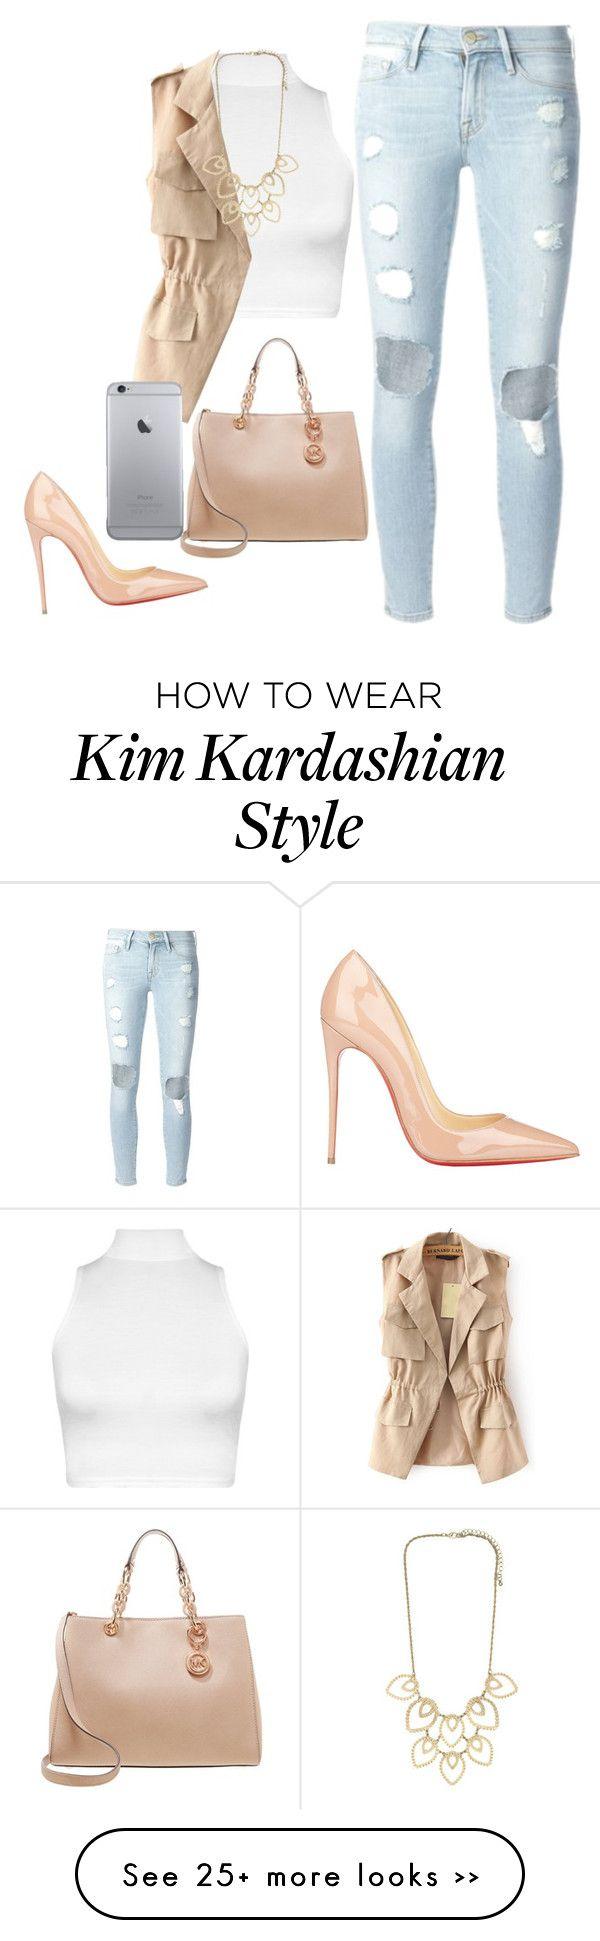 """Kim Kardashian look"" by gabymailk on Polyvore"